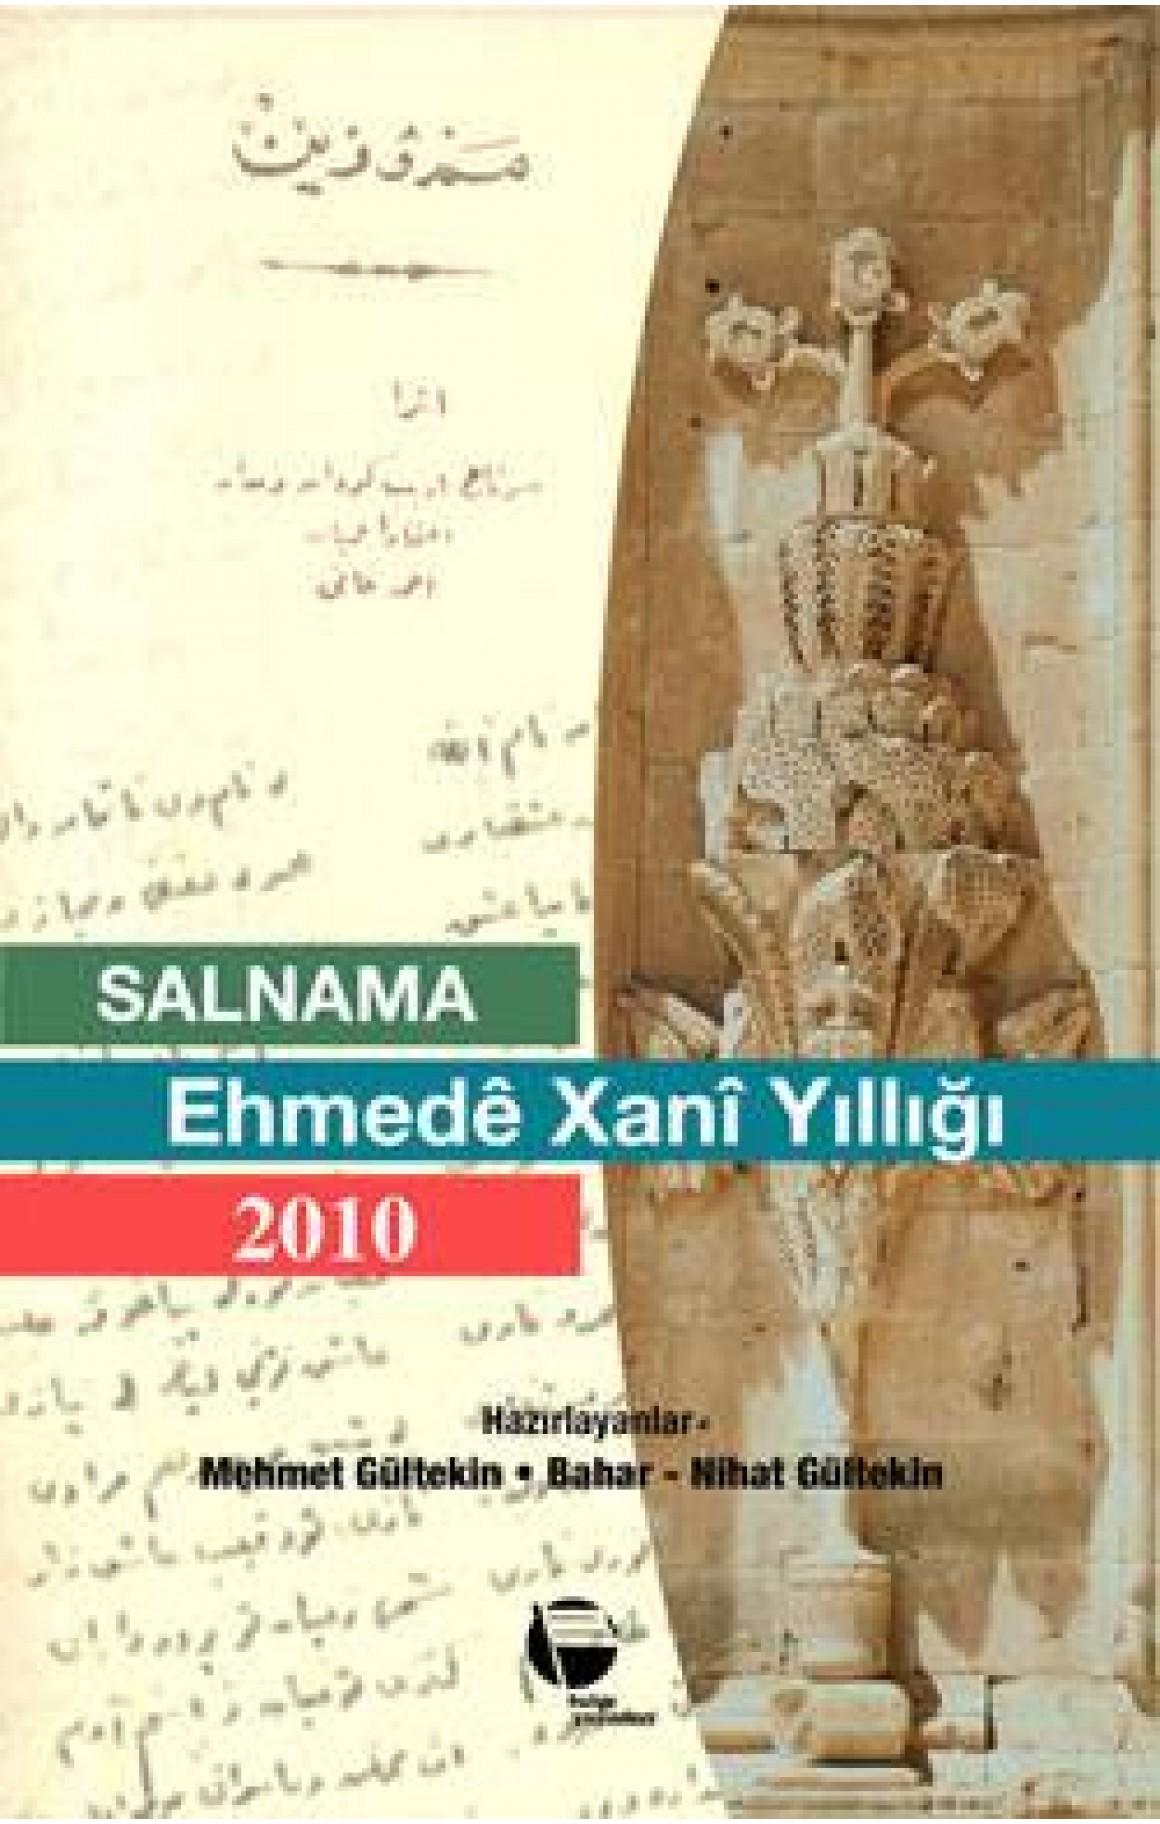 Salnama Ehmede Xani Yıllığı 2010